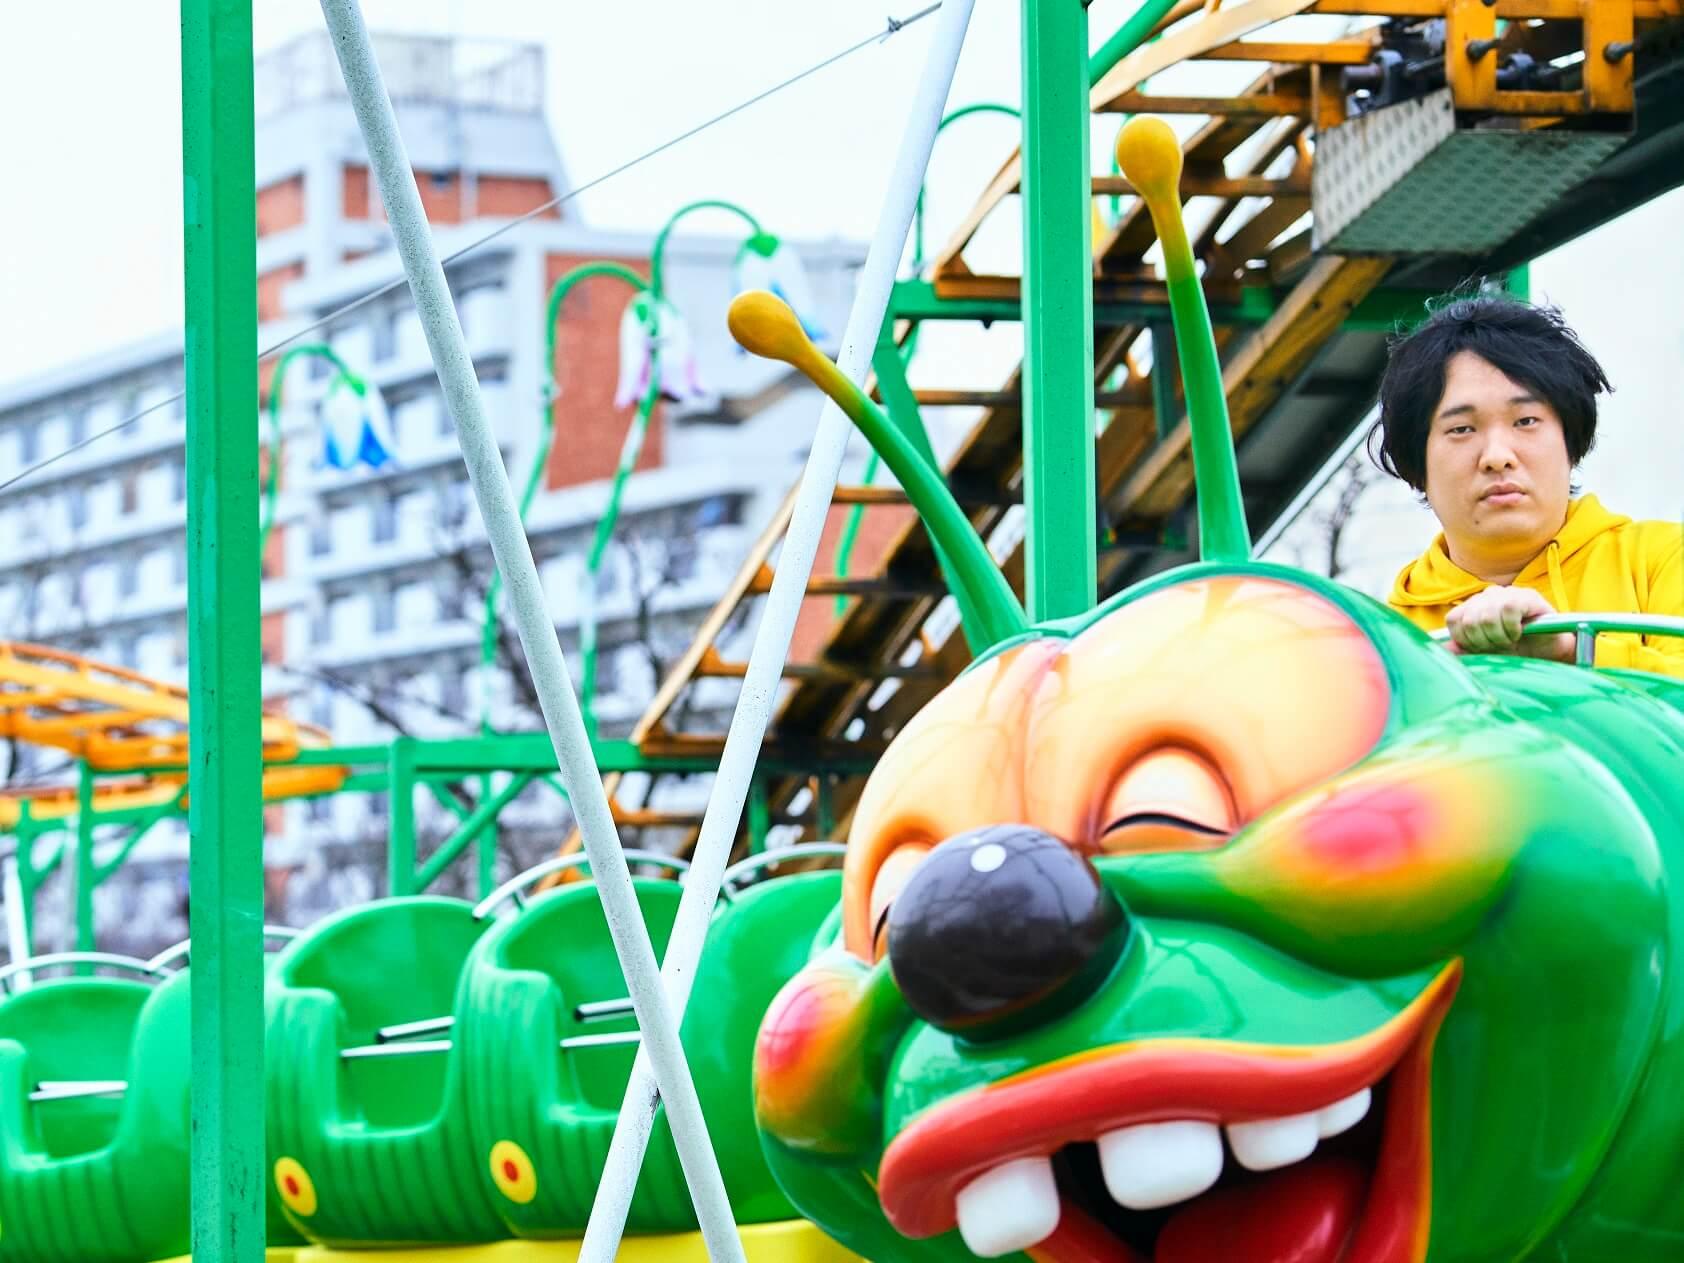 岡崎体育、3rd Album『SAITAMA』発売決定